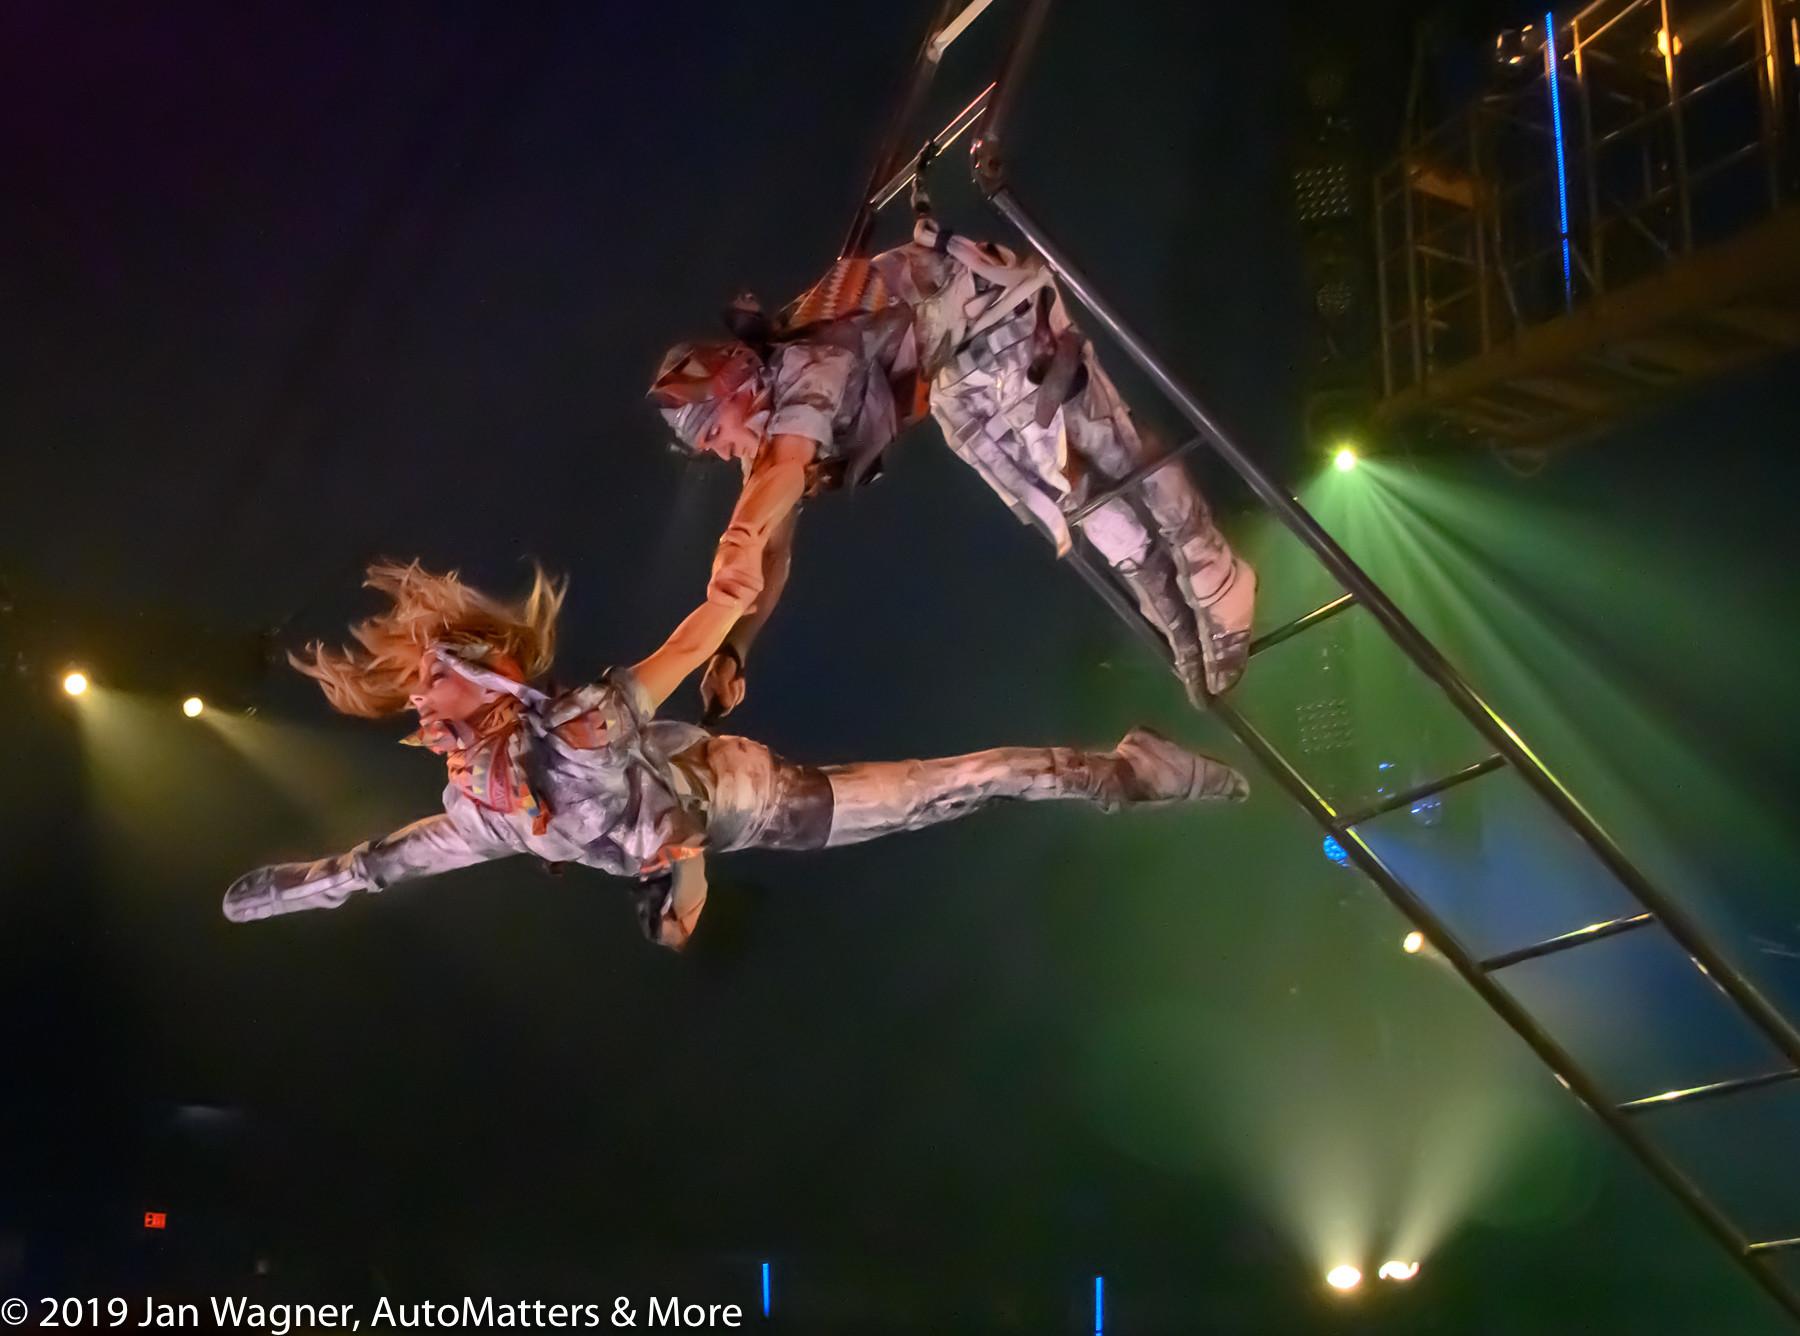 Acrobatic ladder